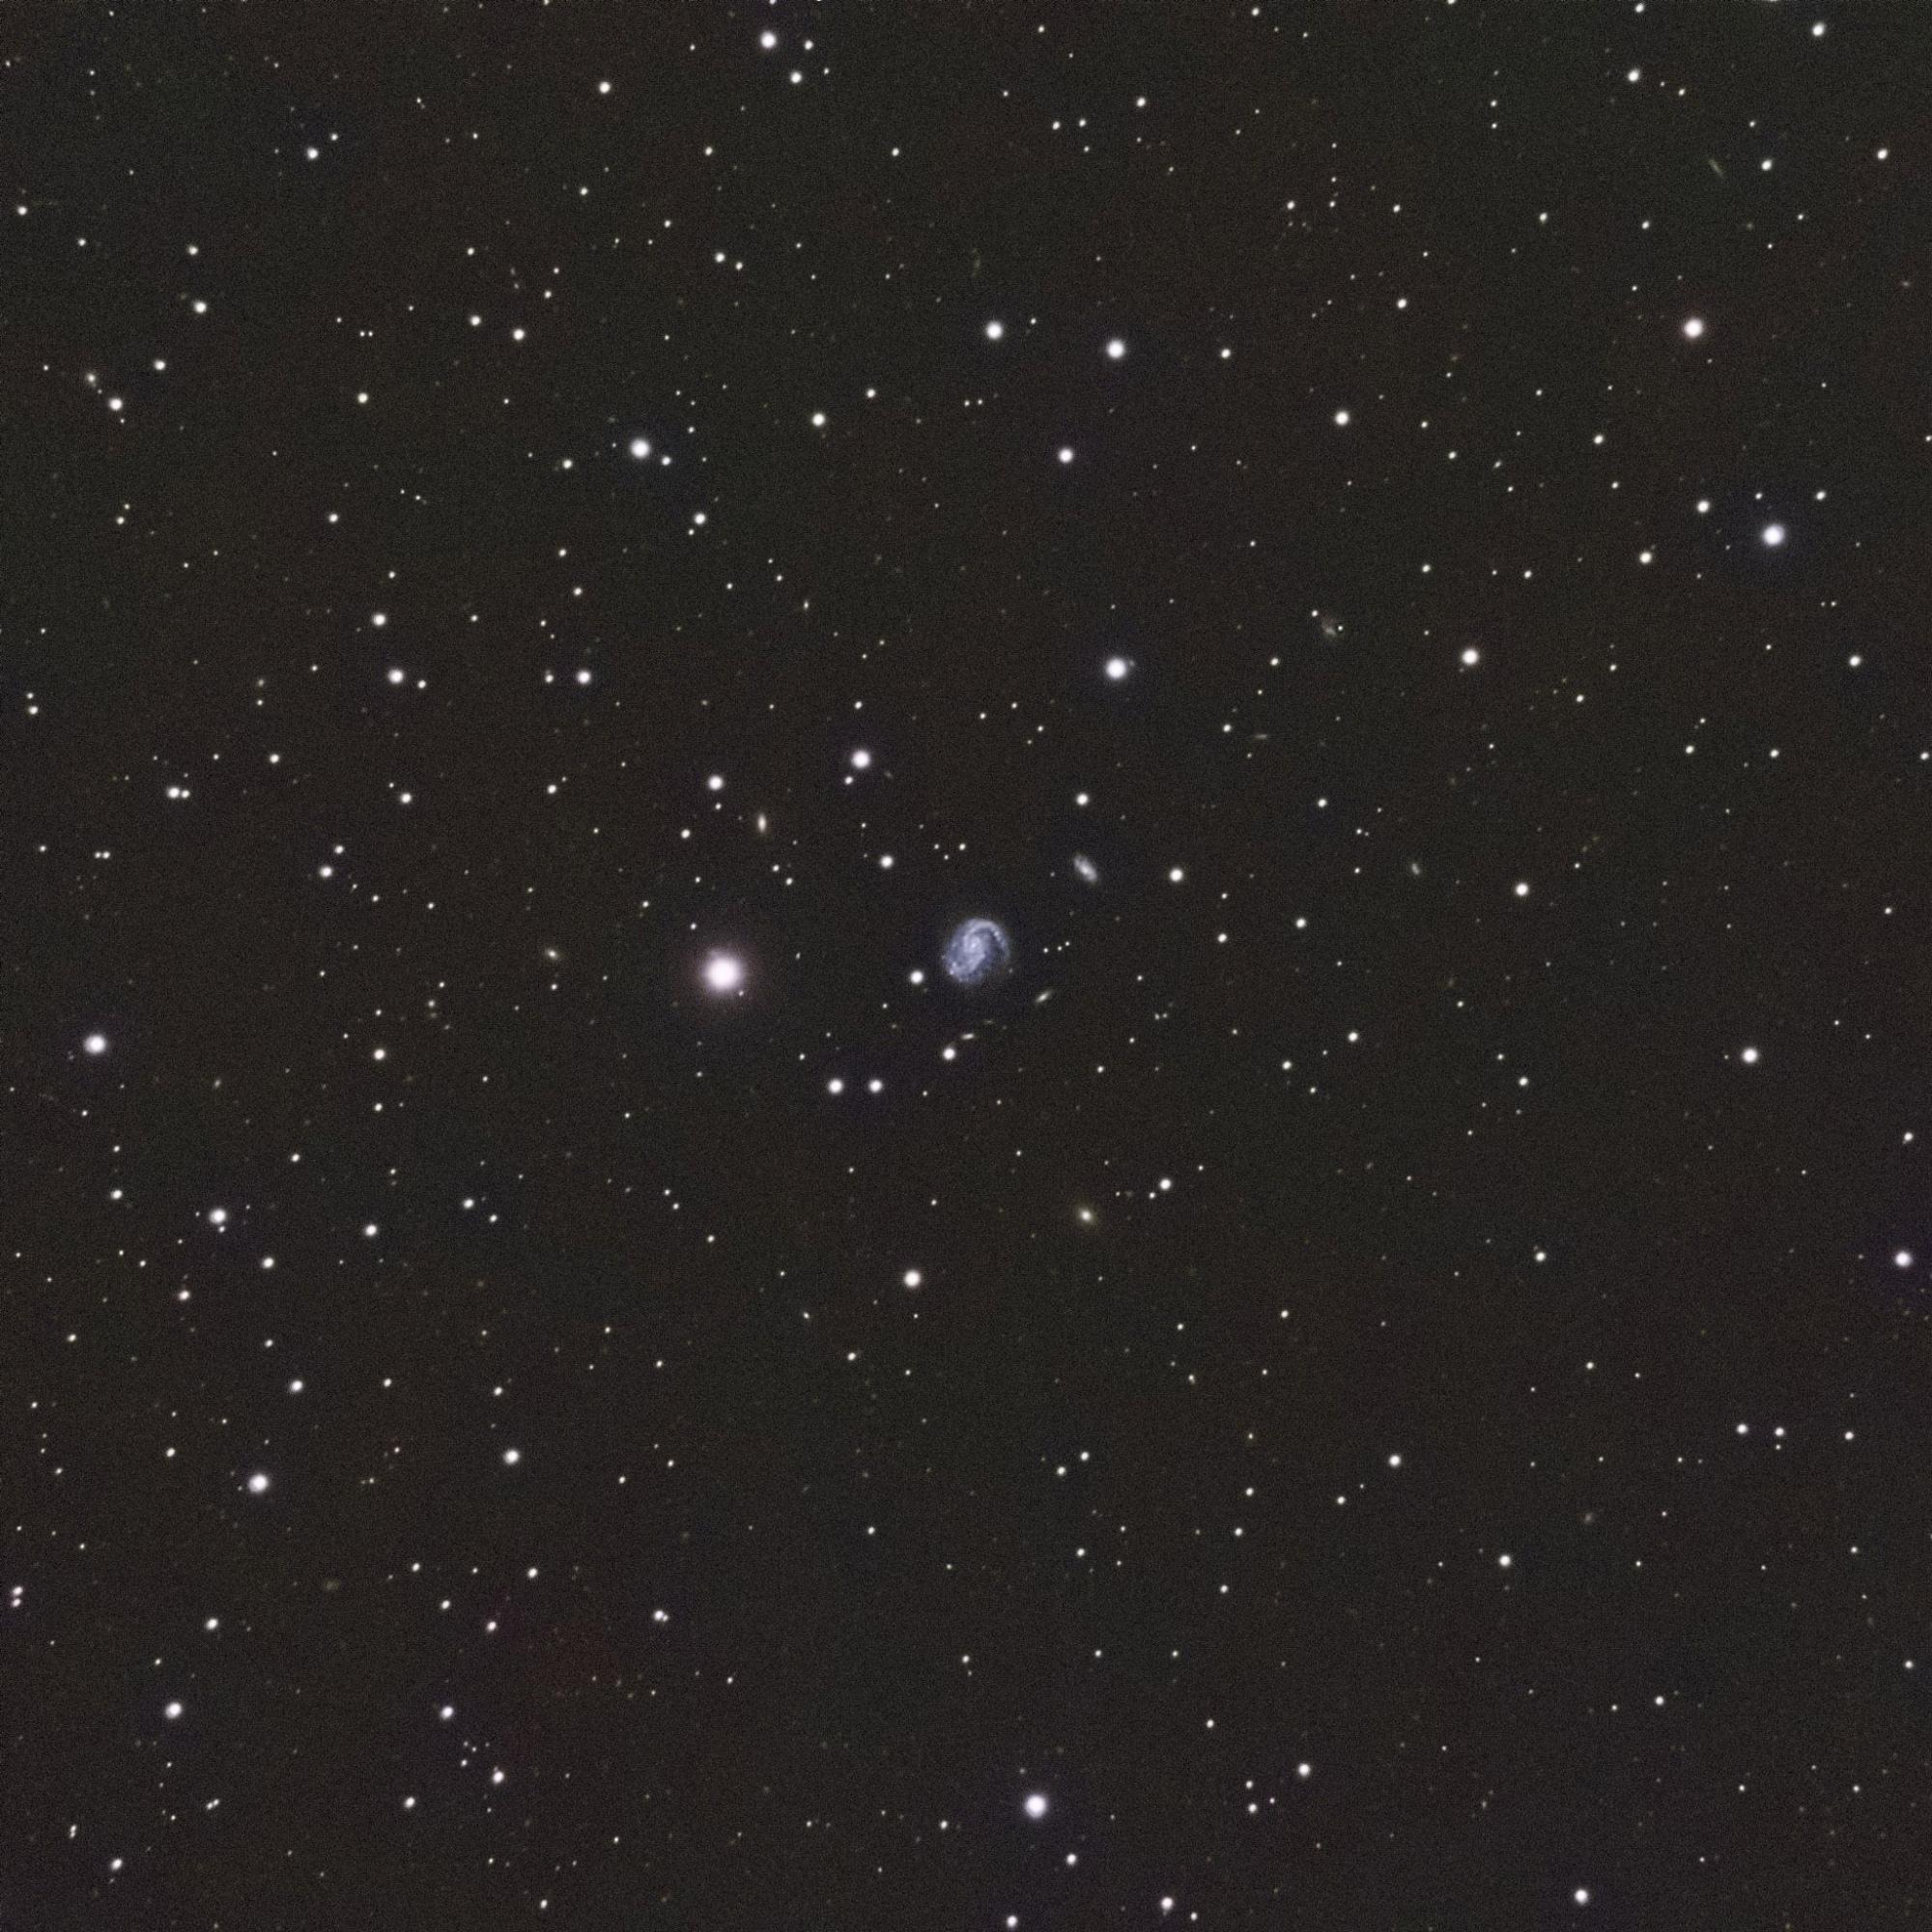 5b0c7f6e463ef_NGC6131C11JeanBriceGAYET.thumb.jpg.c3c739a2fe7f747b89af618488e9946b.jpg